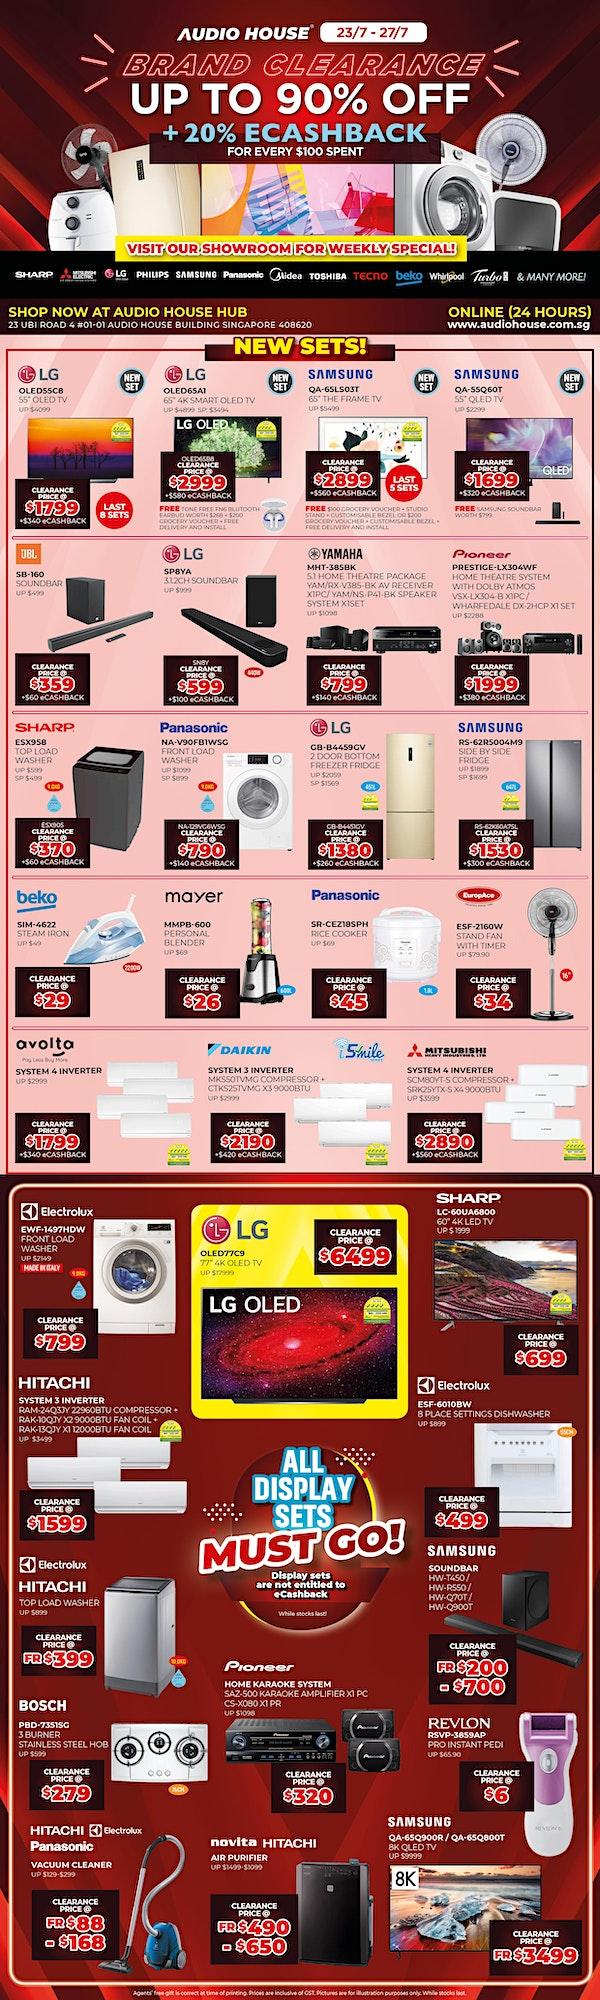 Audio House Brand Clearance Sale image